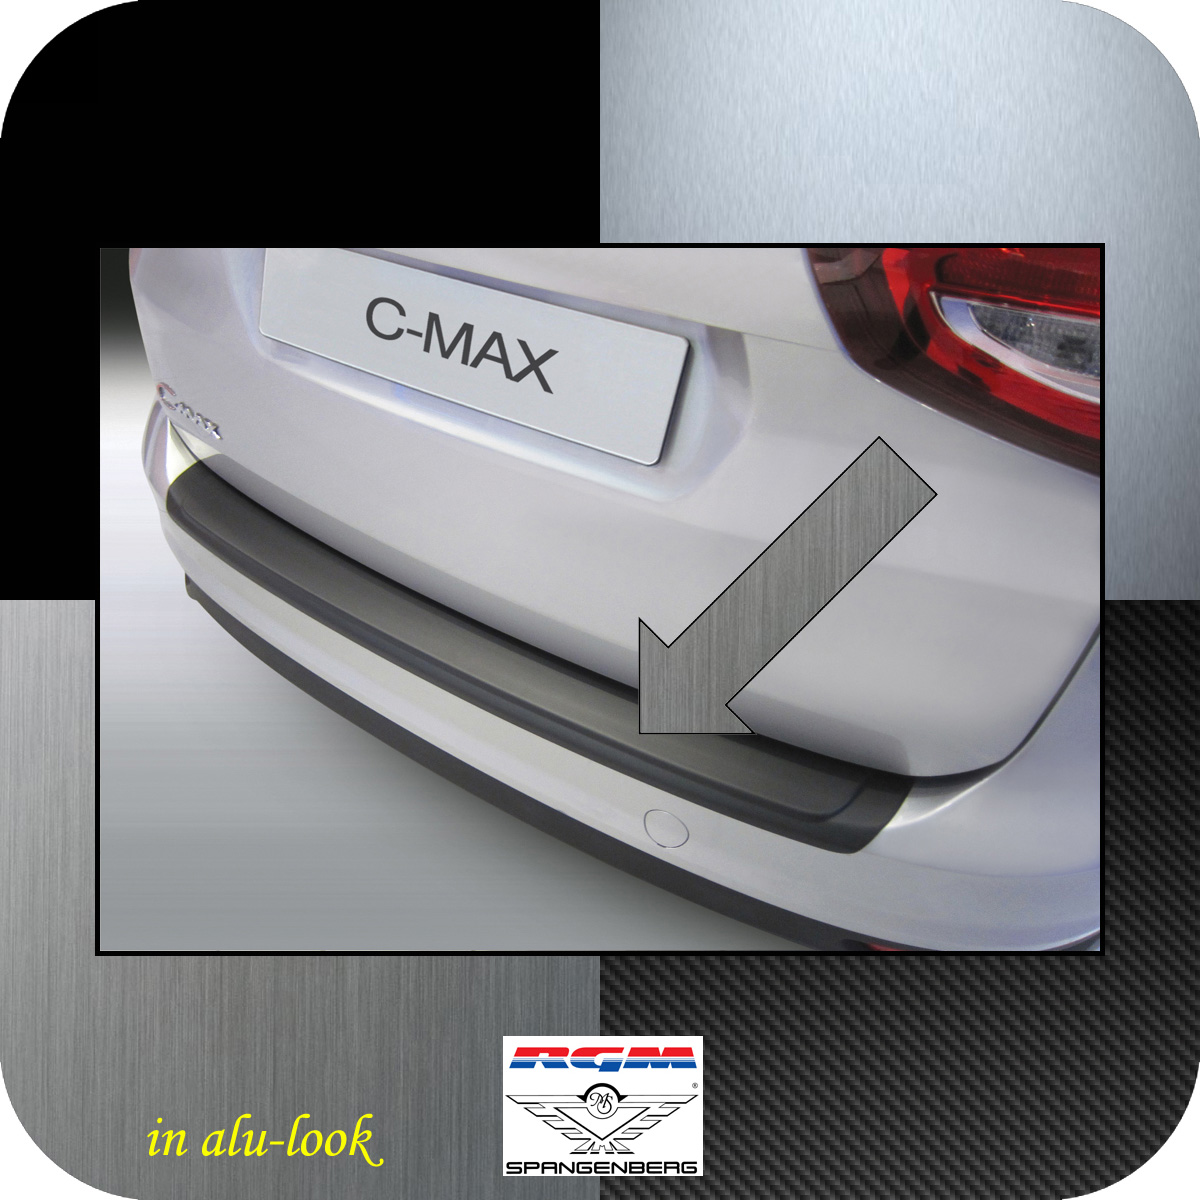 Ladekantenschutz Alu-Look Ford C-MAX II ab facelift Baujahr 2015- 3504889